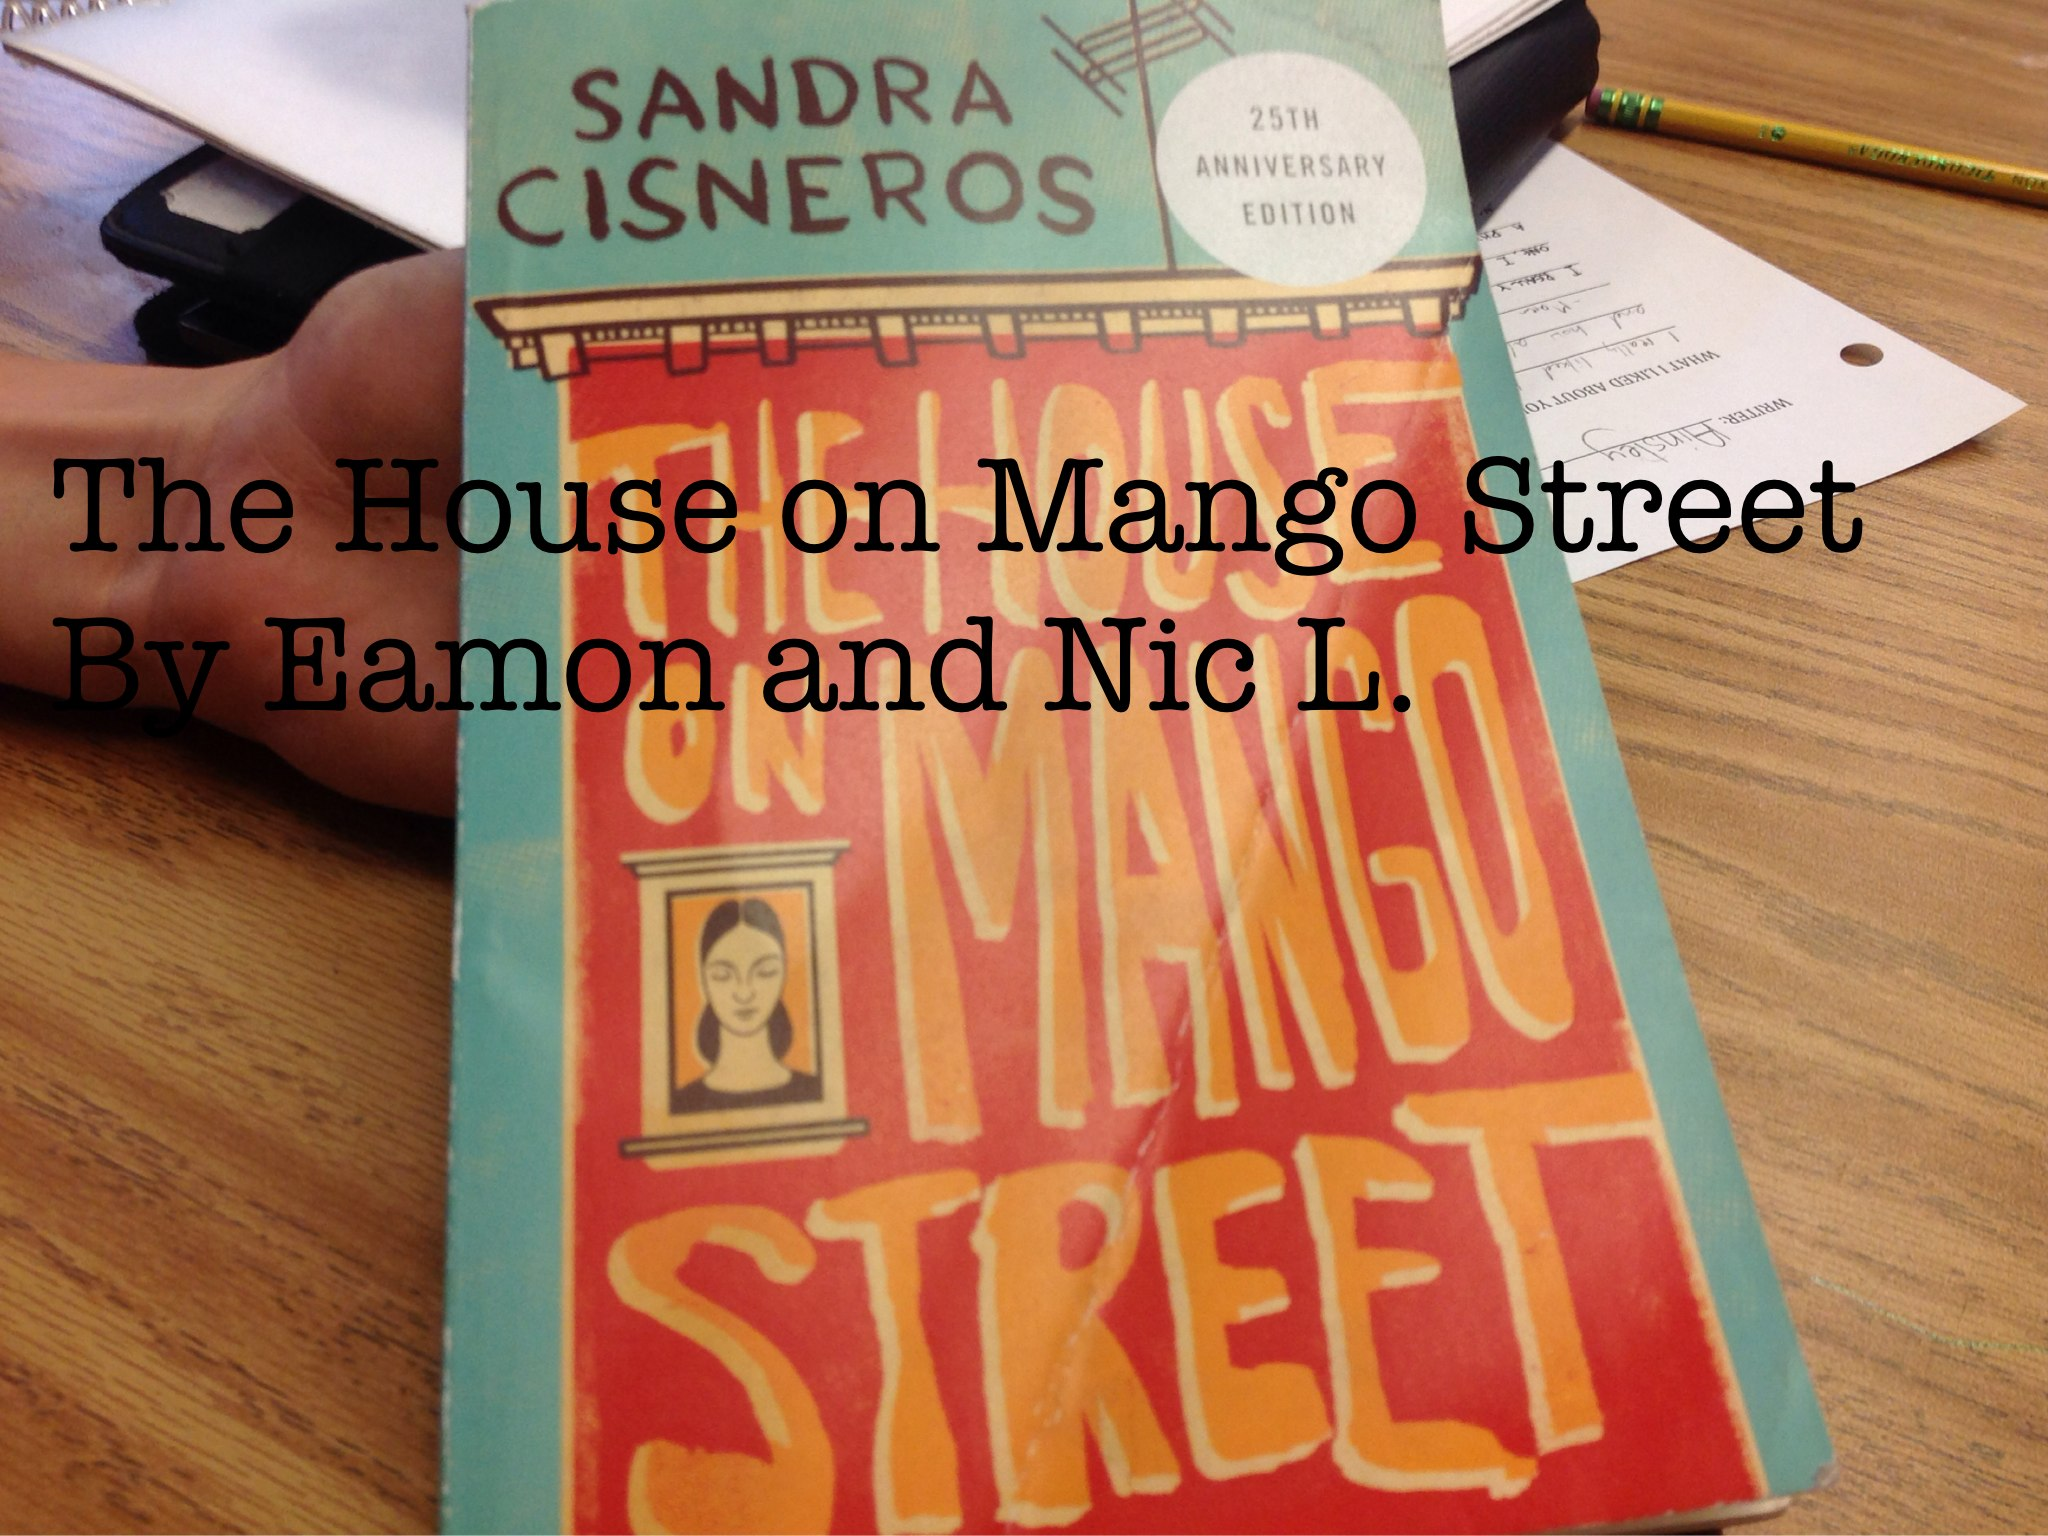 The House on Mango Street - mfawriting332.web.fc2.com